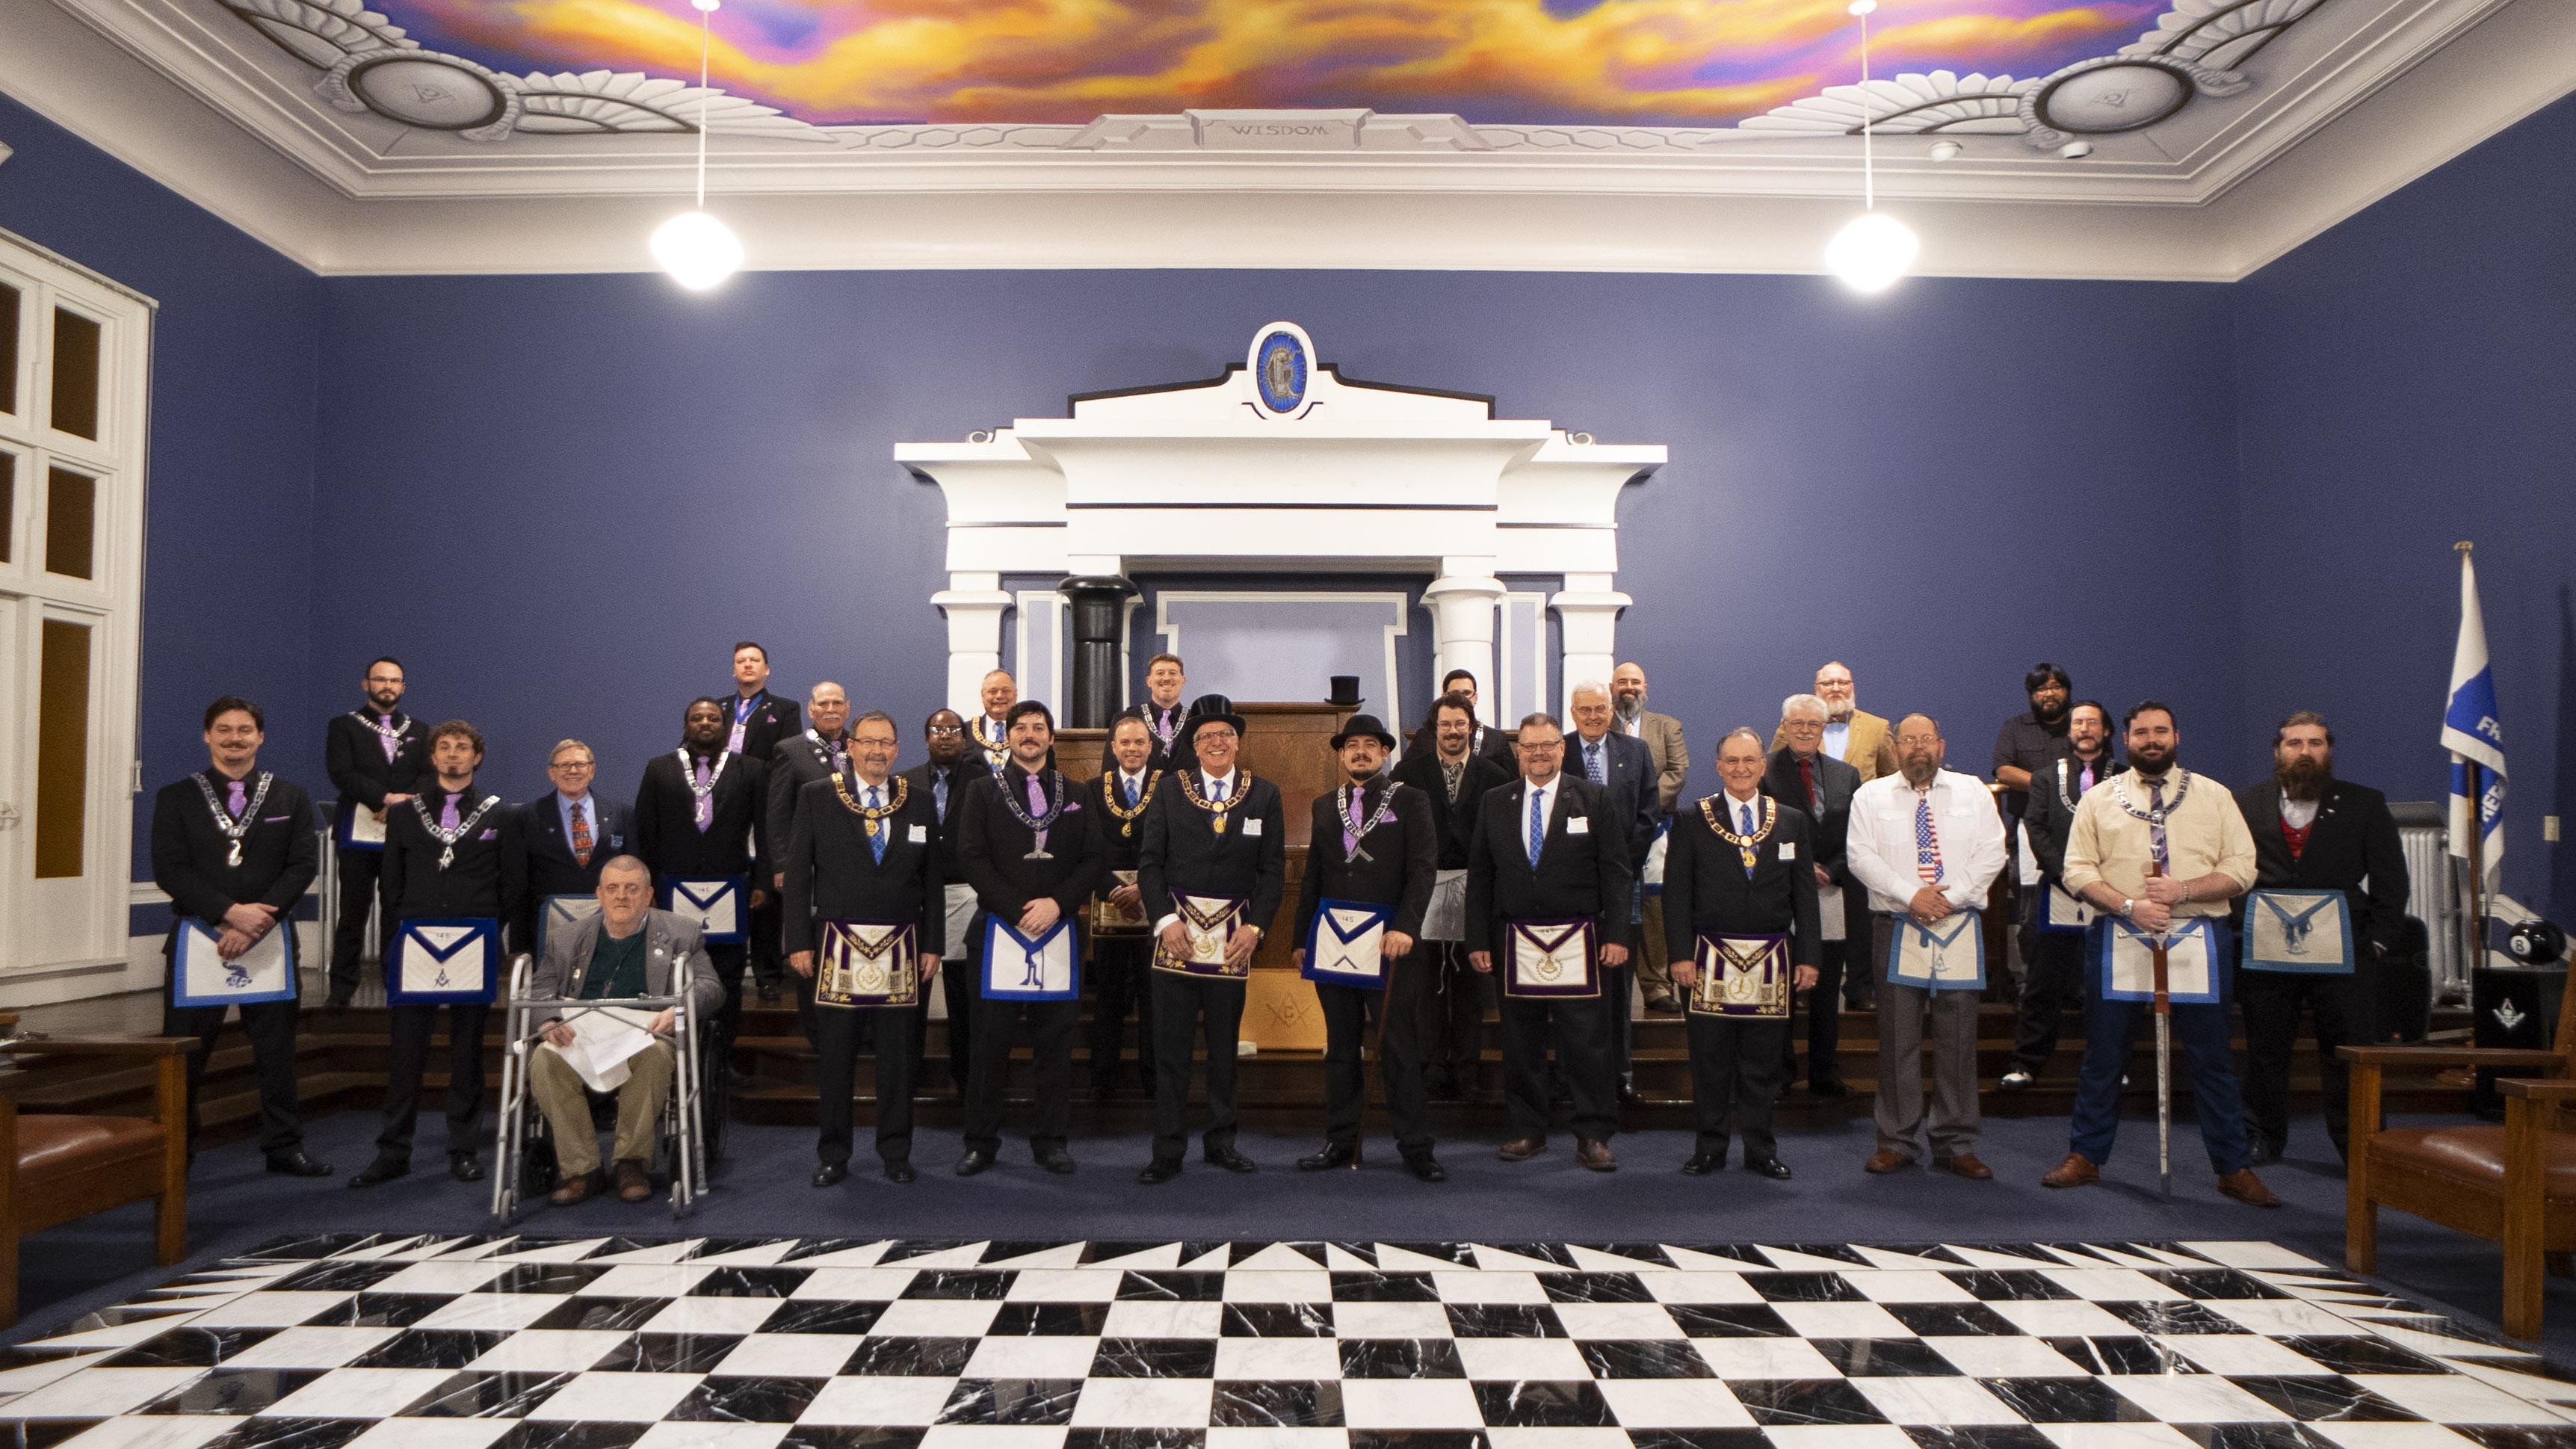 grandmasters visitation - official pose